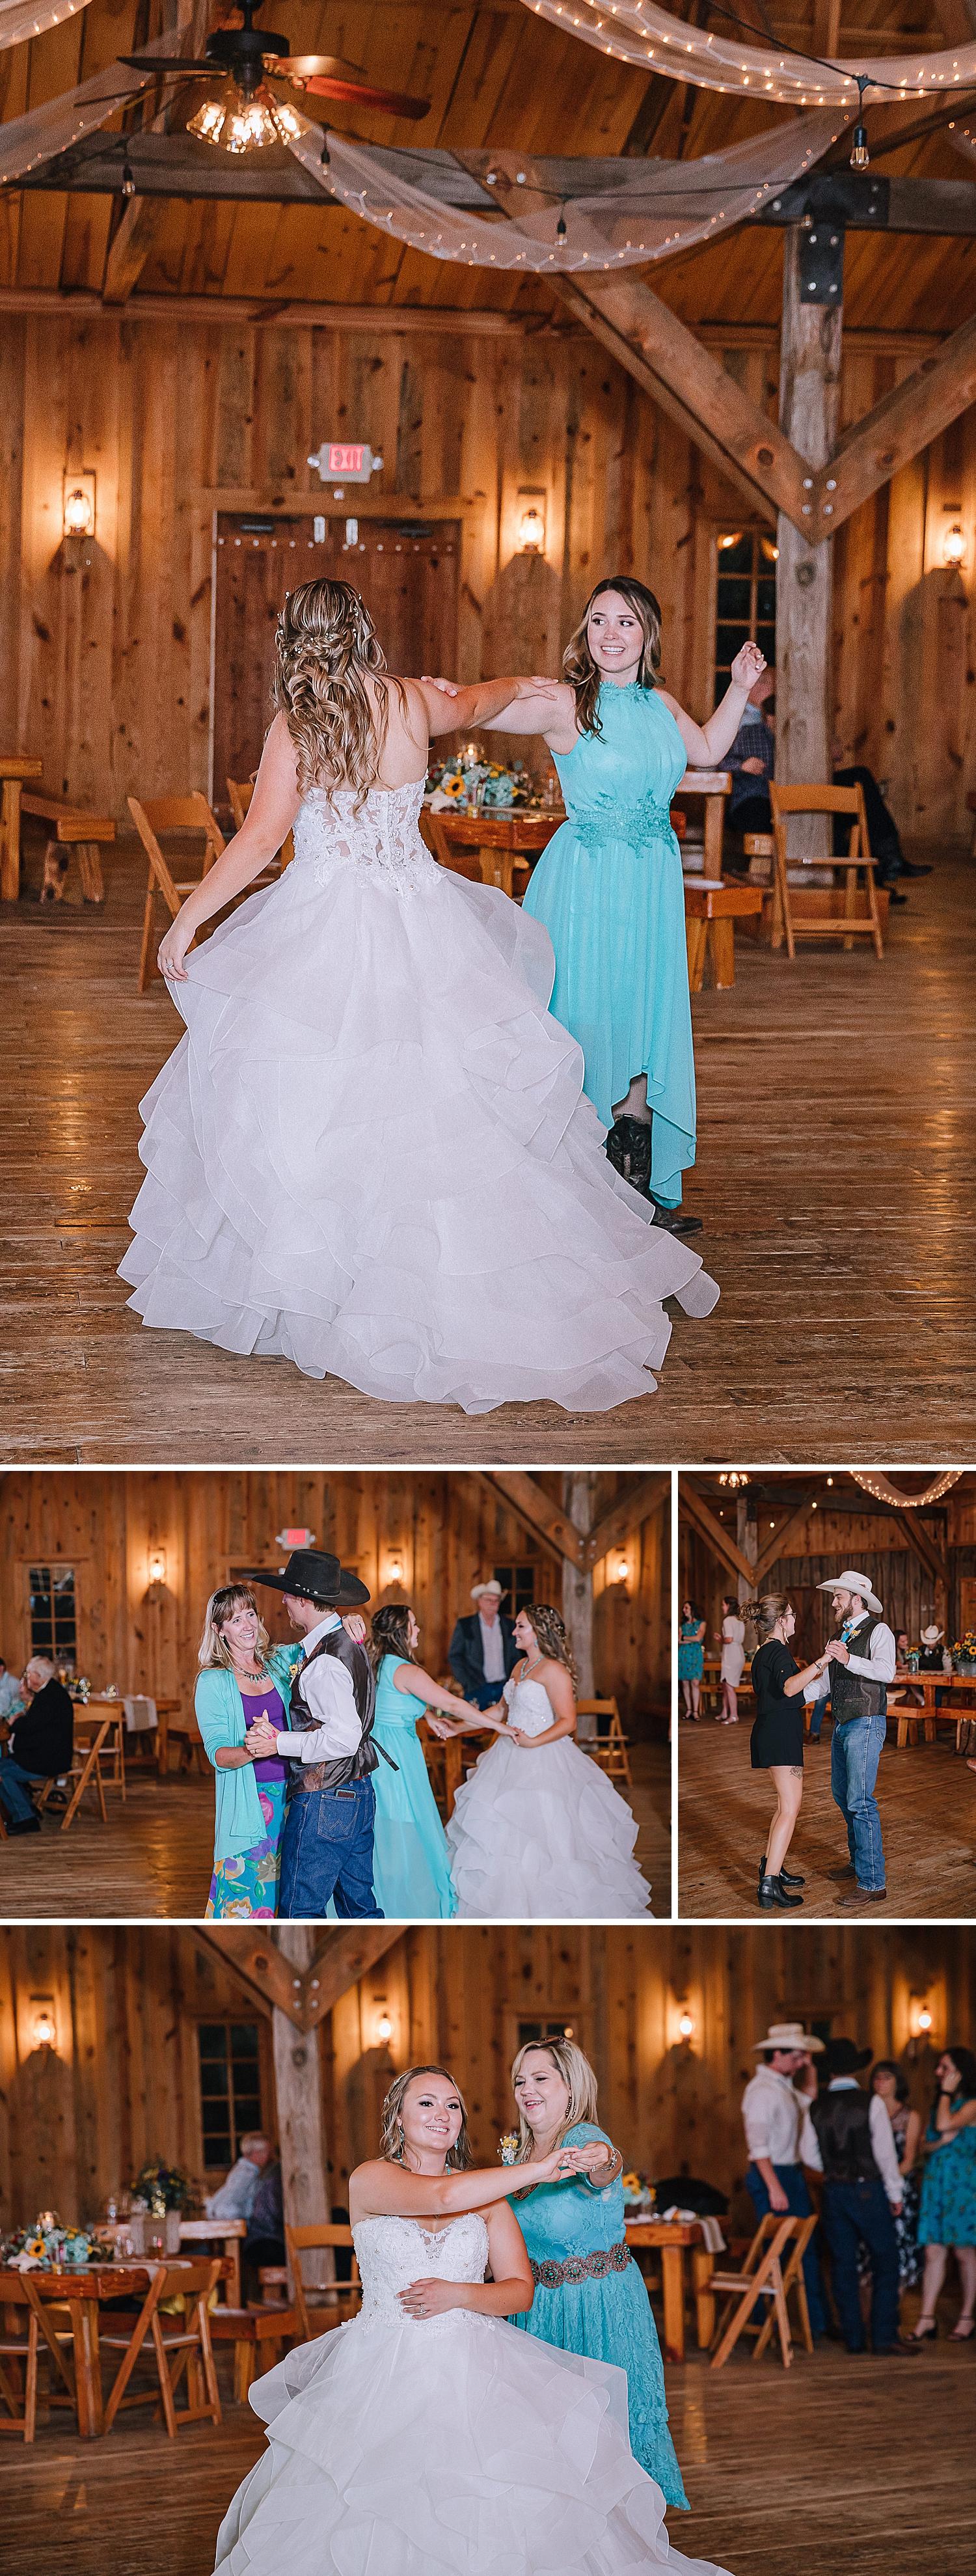 Carly-Barton-Photography-Old-Town-Texas-Rustic-Wedding-Photos-Sunflowers-Boots-Kyle-Texas_0116.jpg